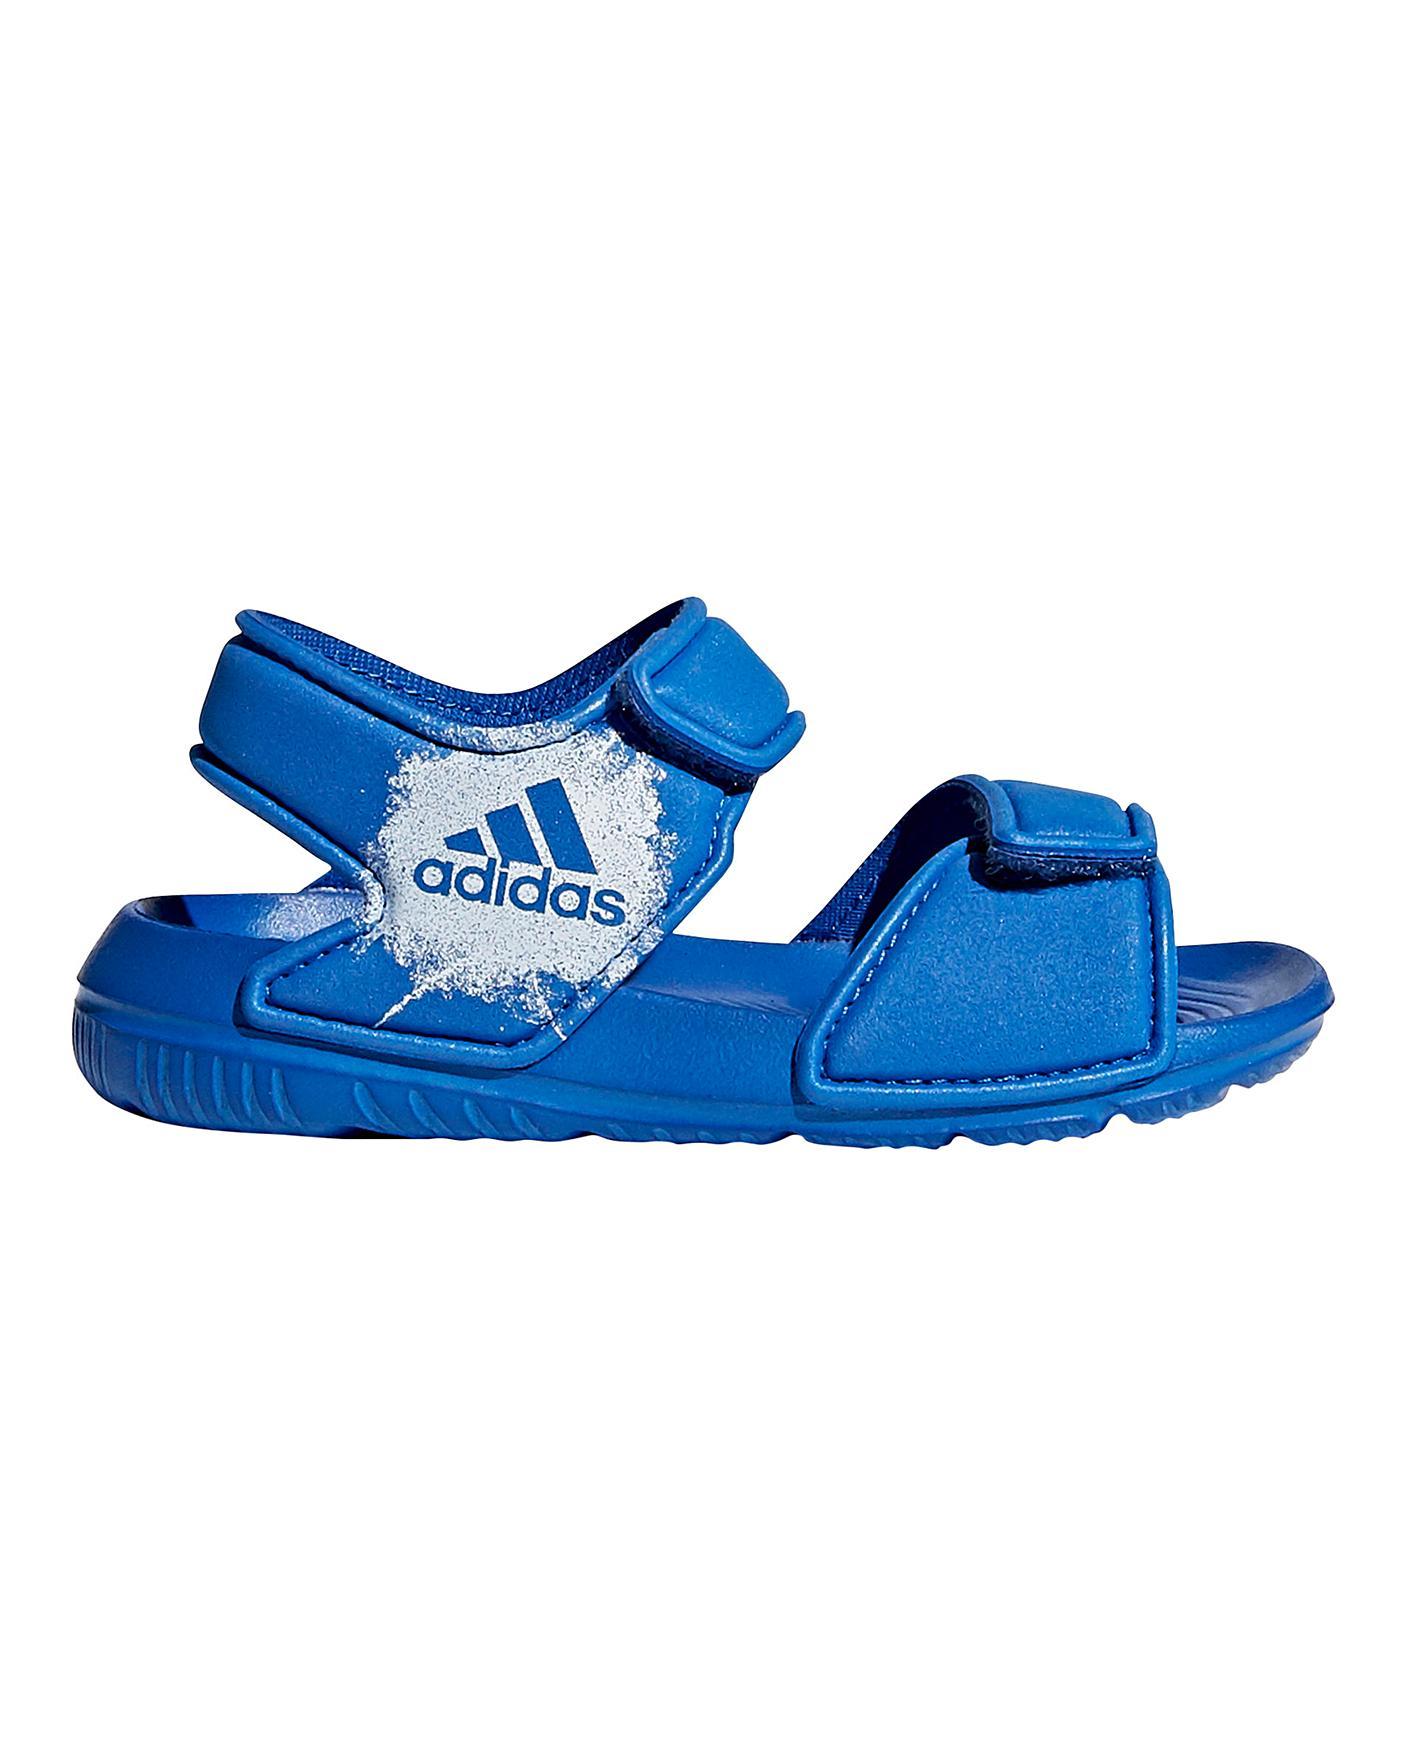 Adidas Altaswim Infant Sandals   Oxendales